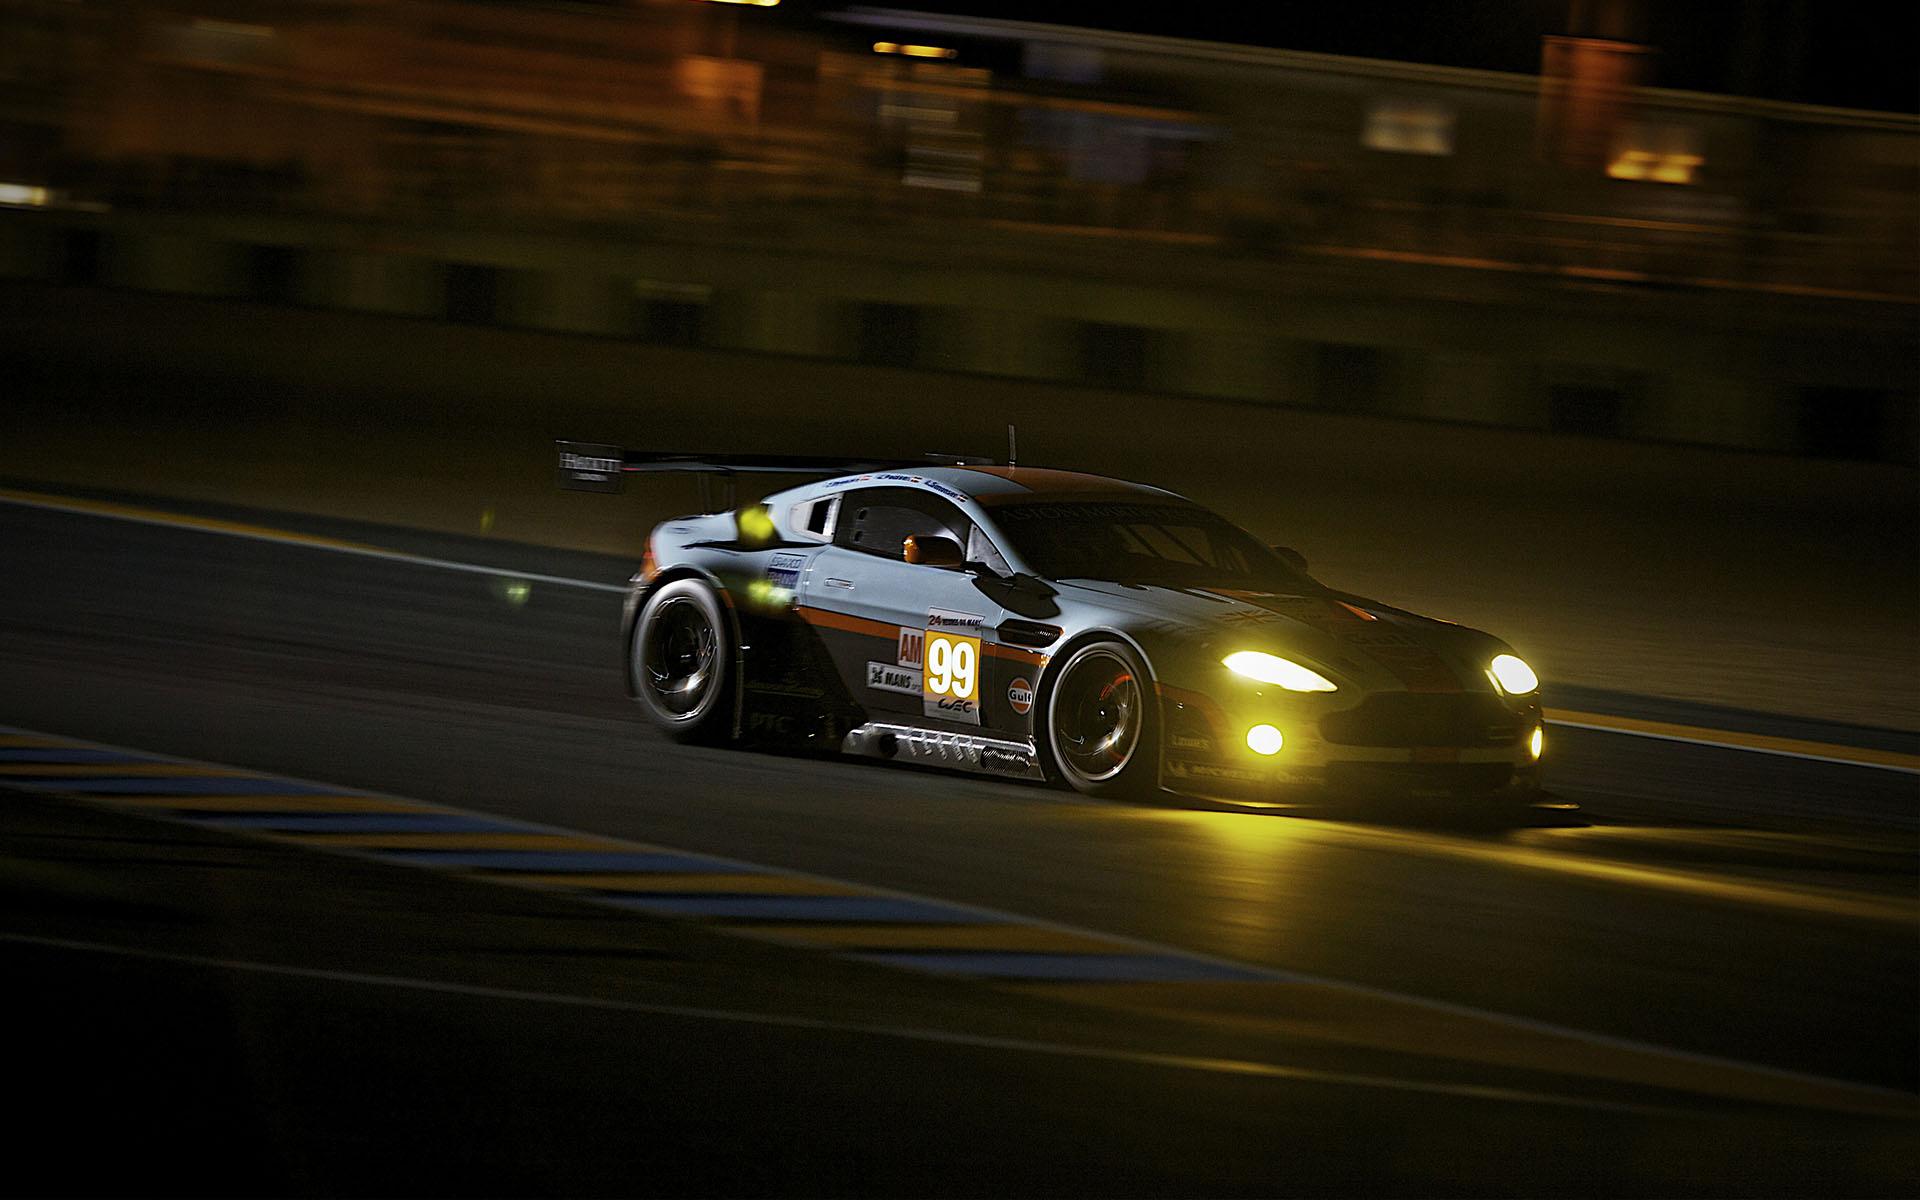 Aston Martin Vantage Night Race Wallpaper Hd Car Wallpapers